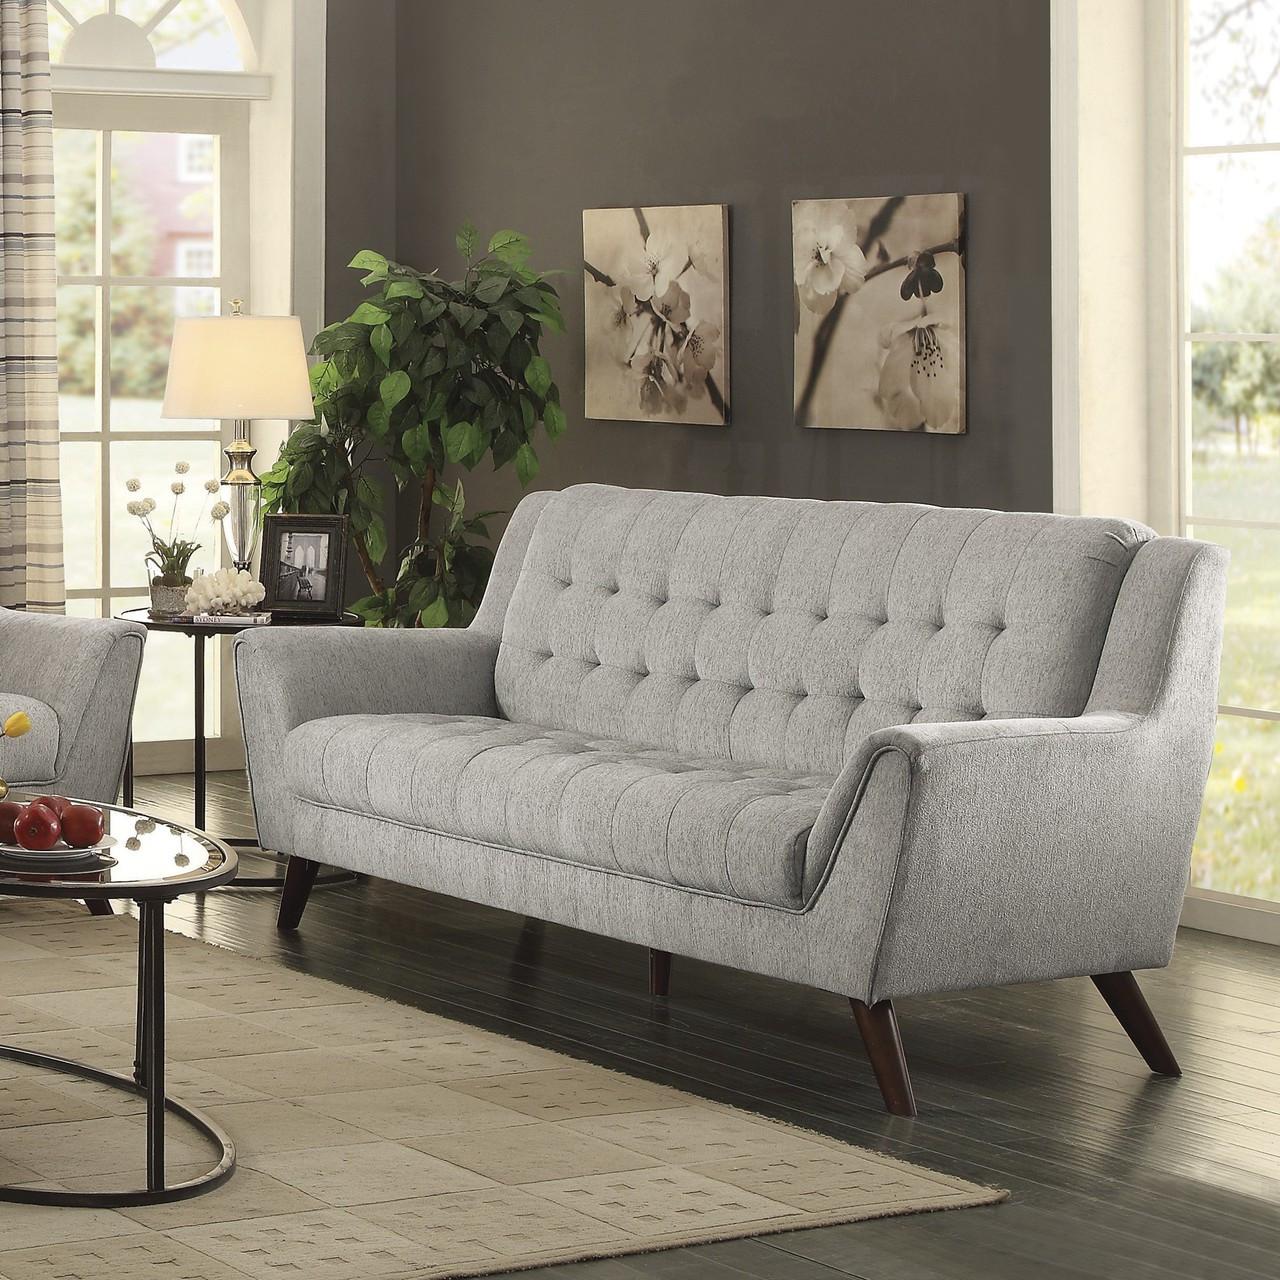 Coaster natalia button tufted modern sofa in dove grey for Sofa 500 euro